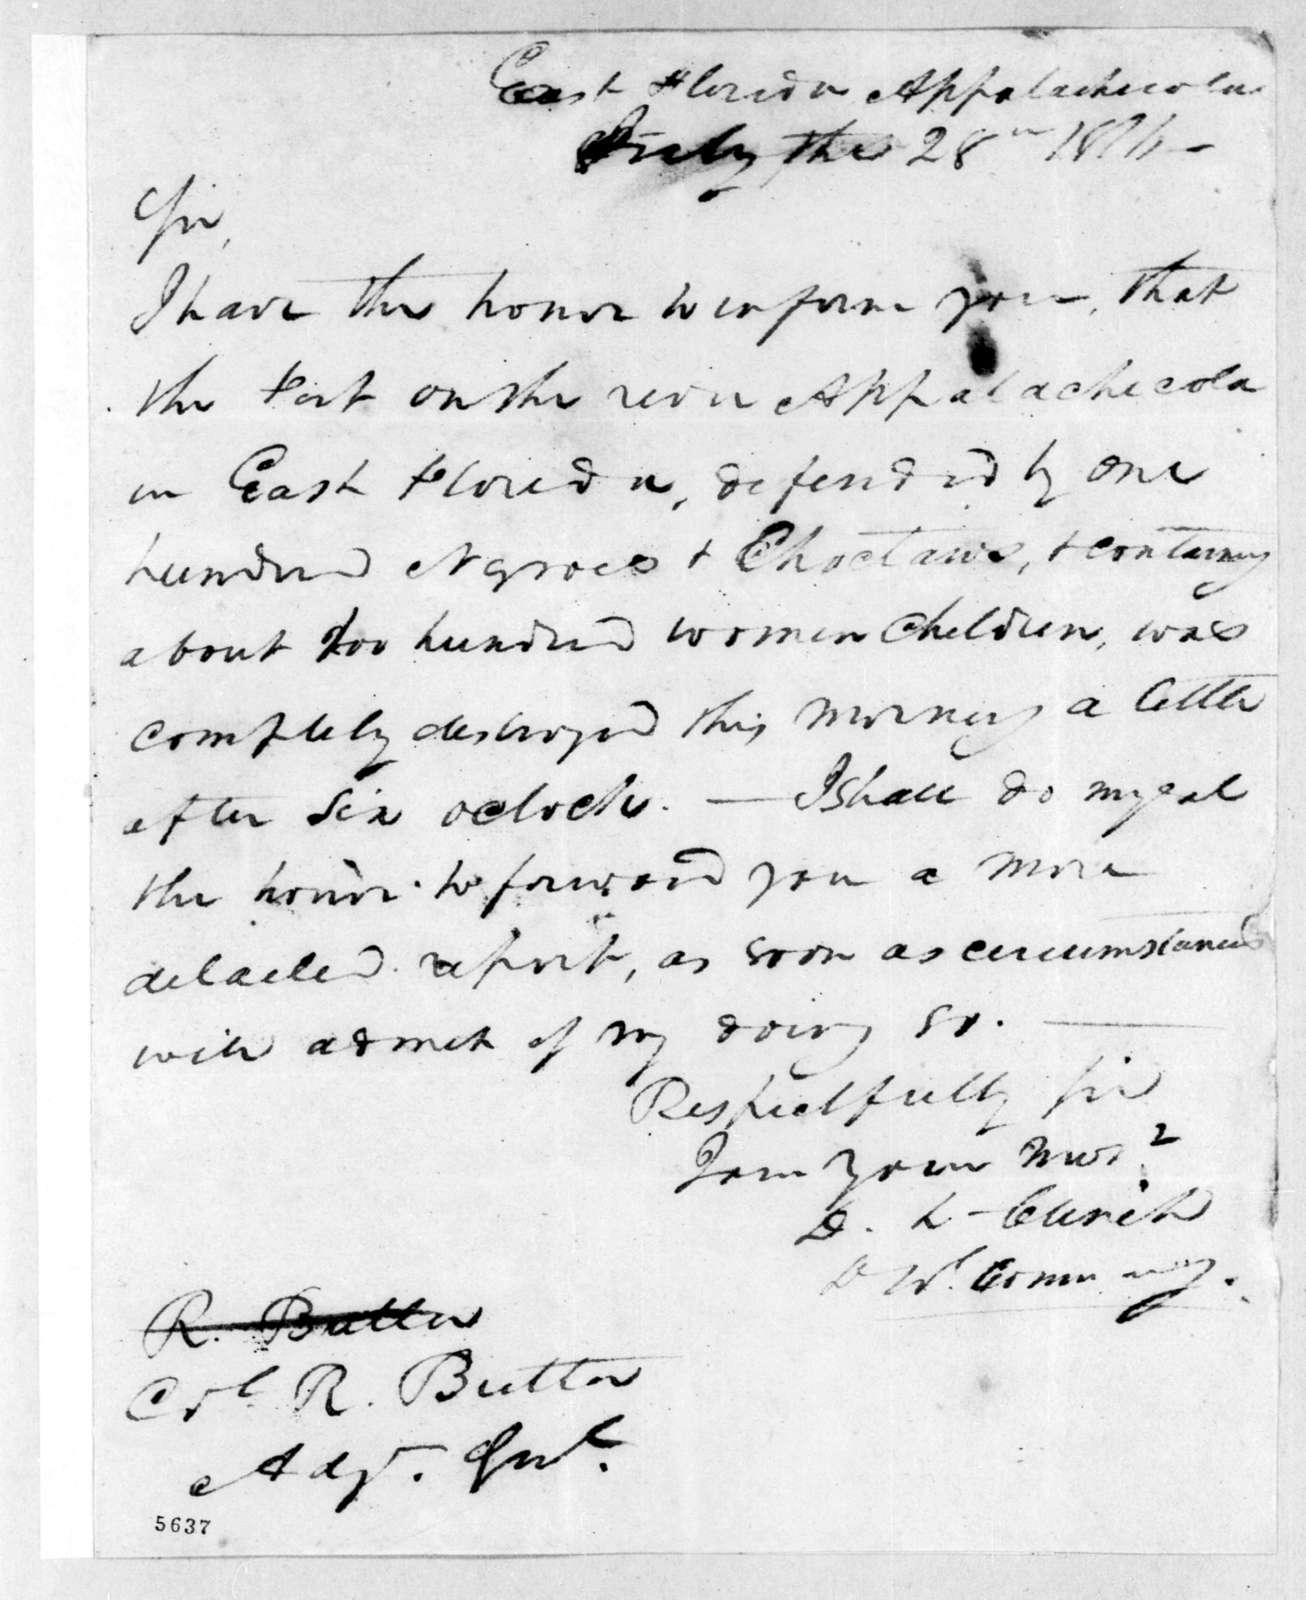 Duncan Lamont Clinch to Robert Butler, July 28, 1816